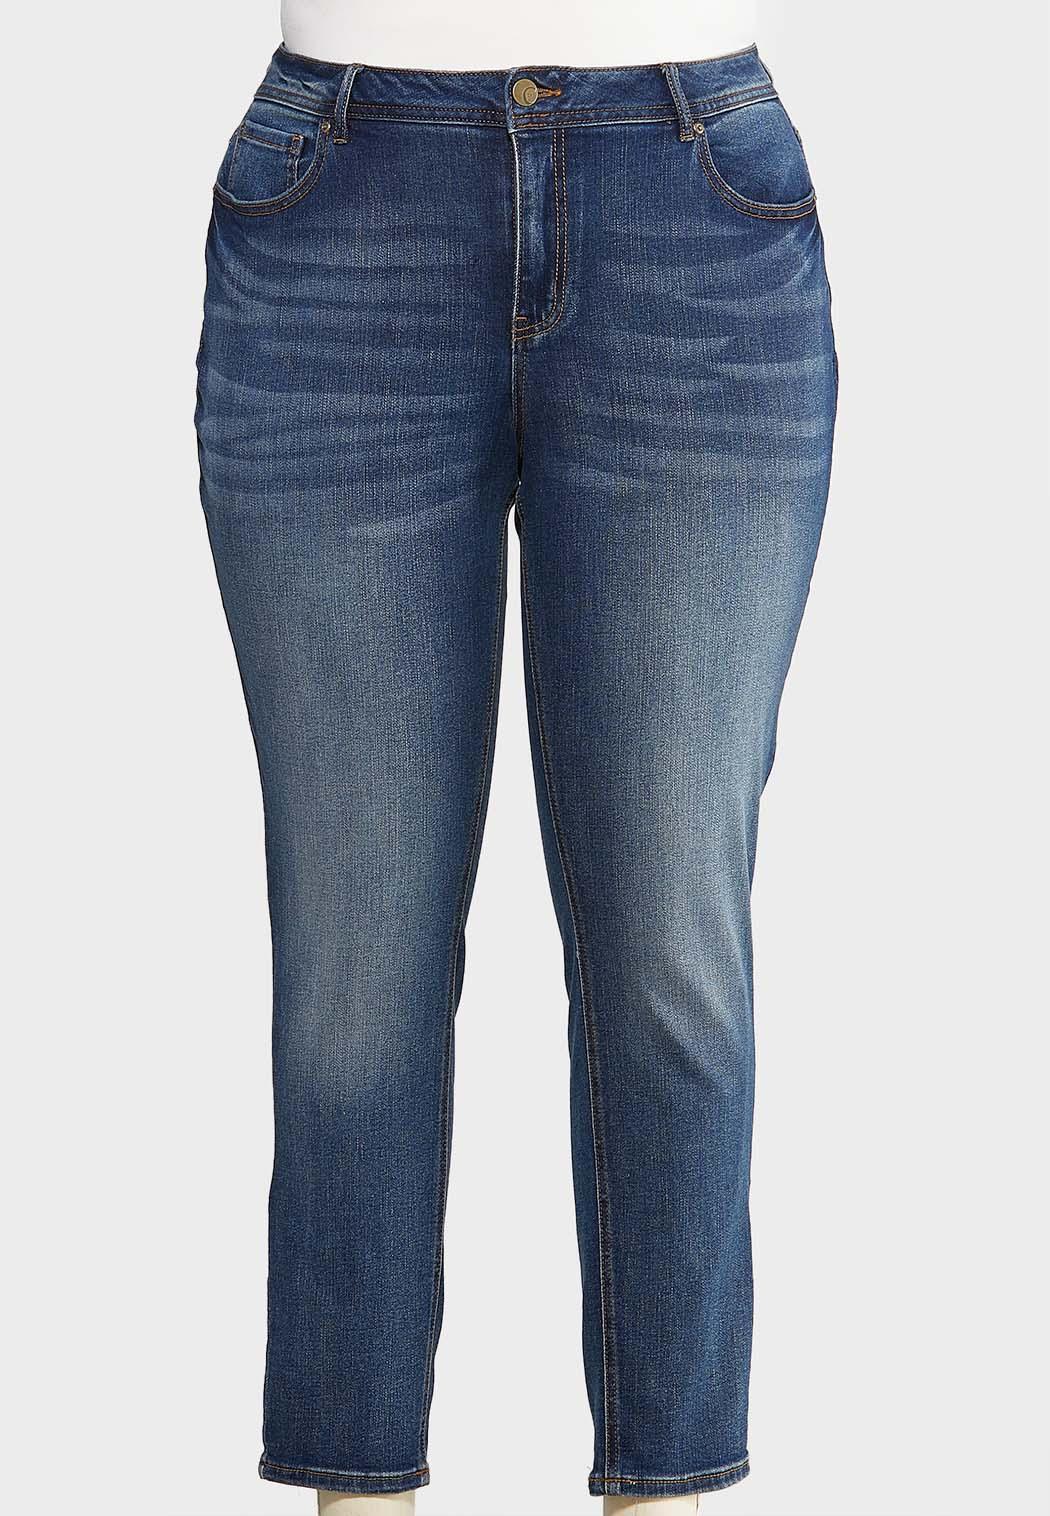 Plus Size Classic Skinny Jeans